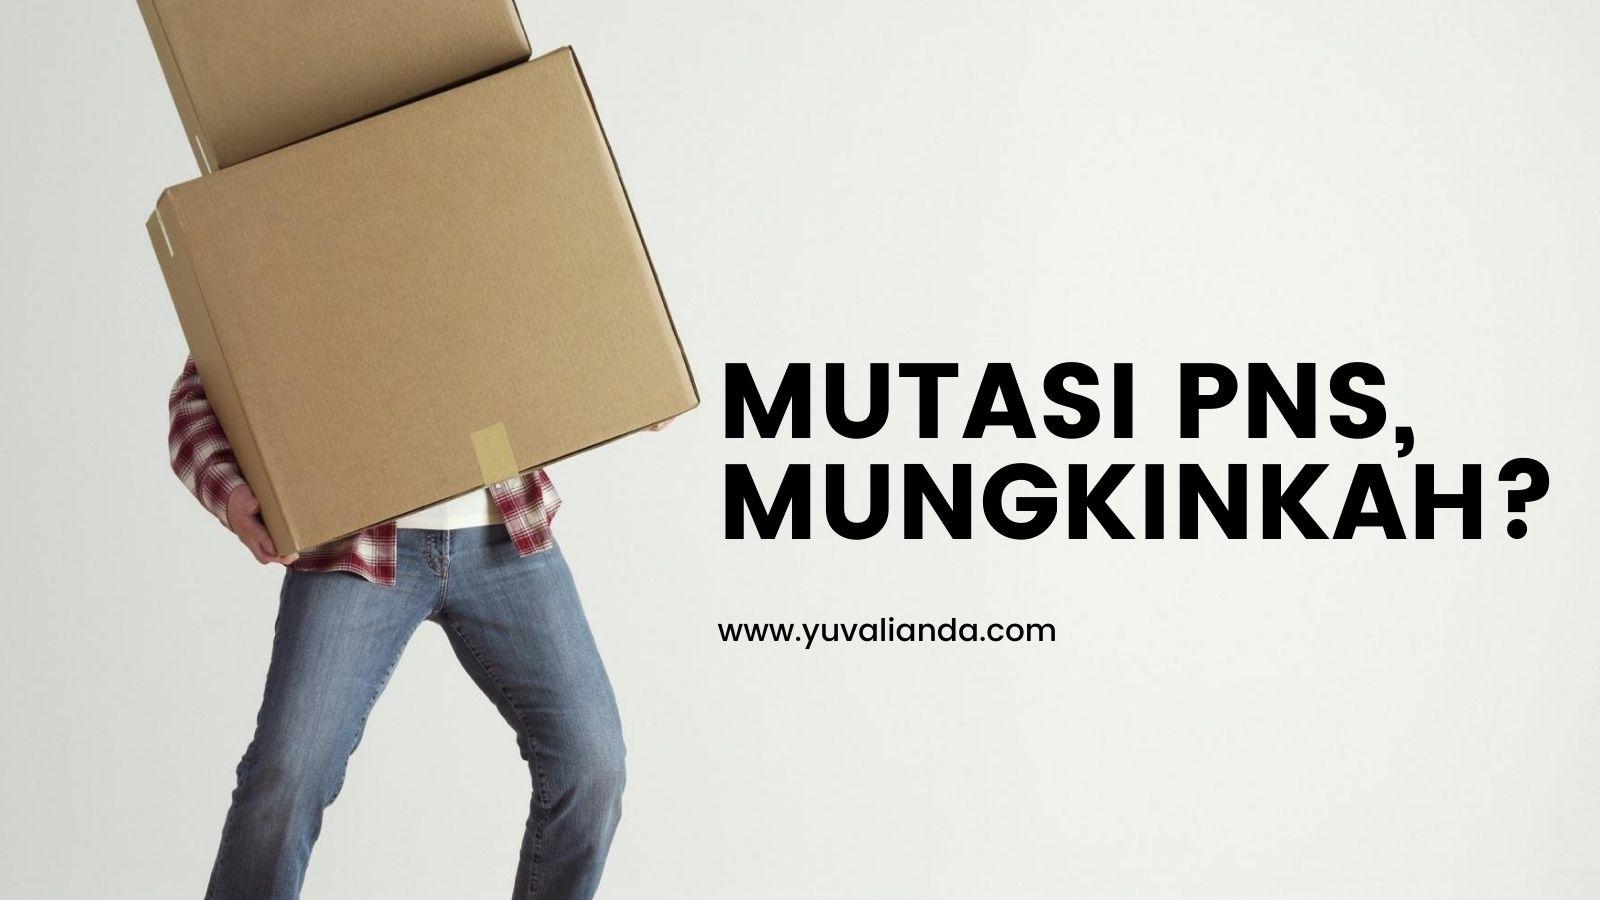 mutasi-pns